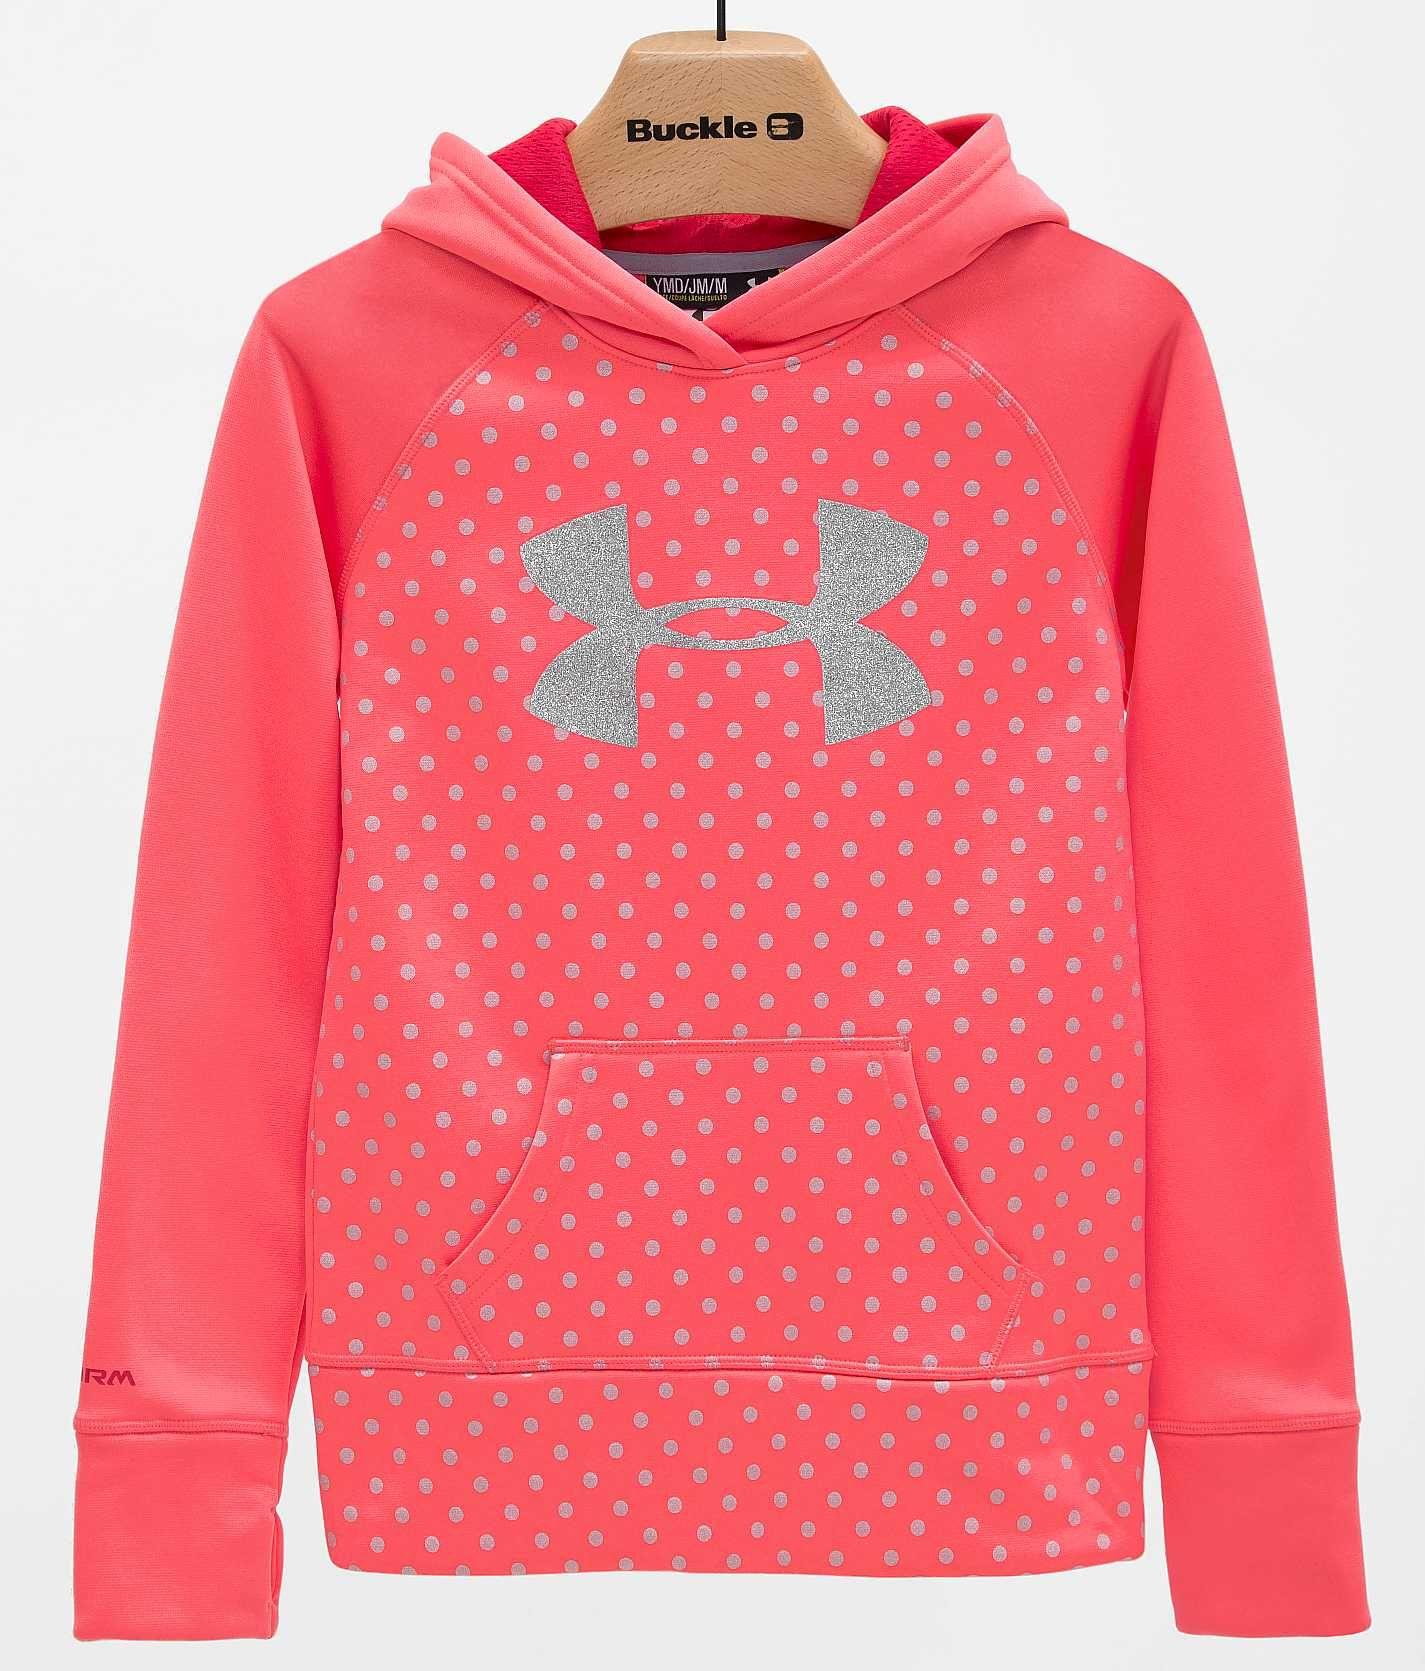 Girls - Under Armour Big Logo Sweatshirt - Girl's Sweatshirts ...